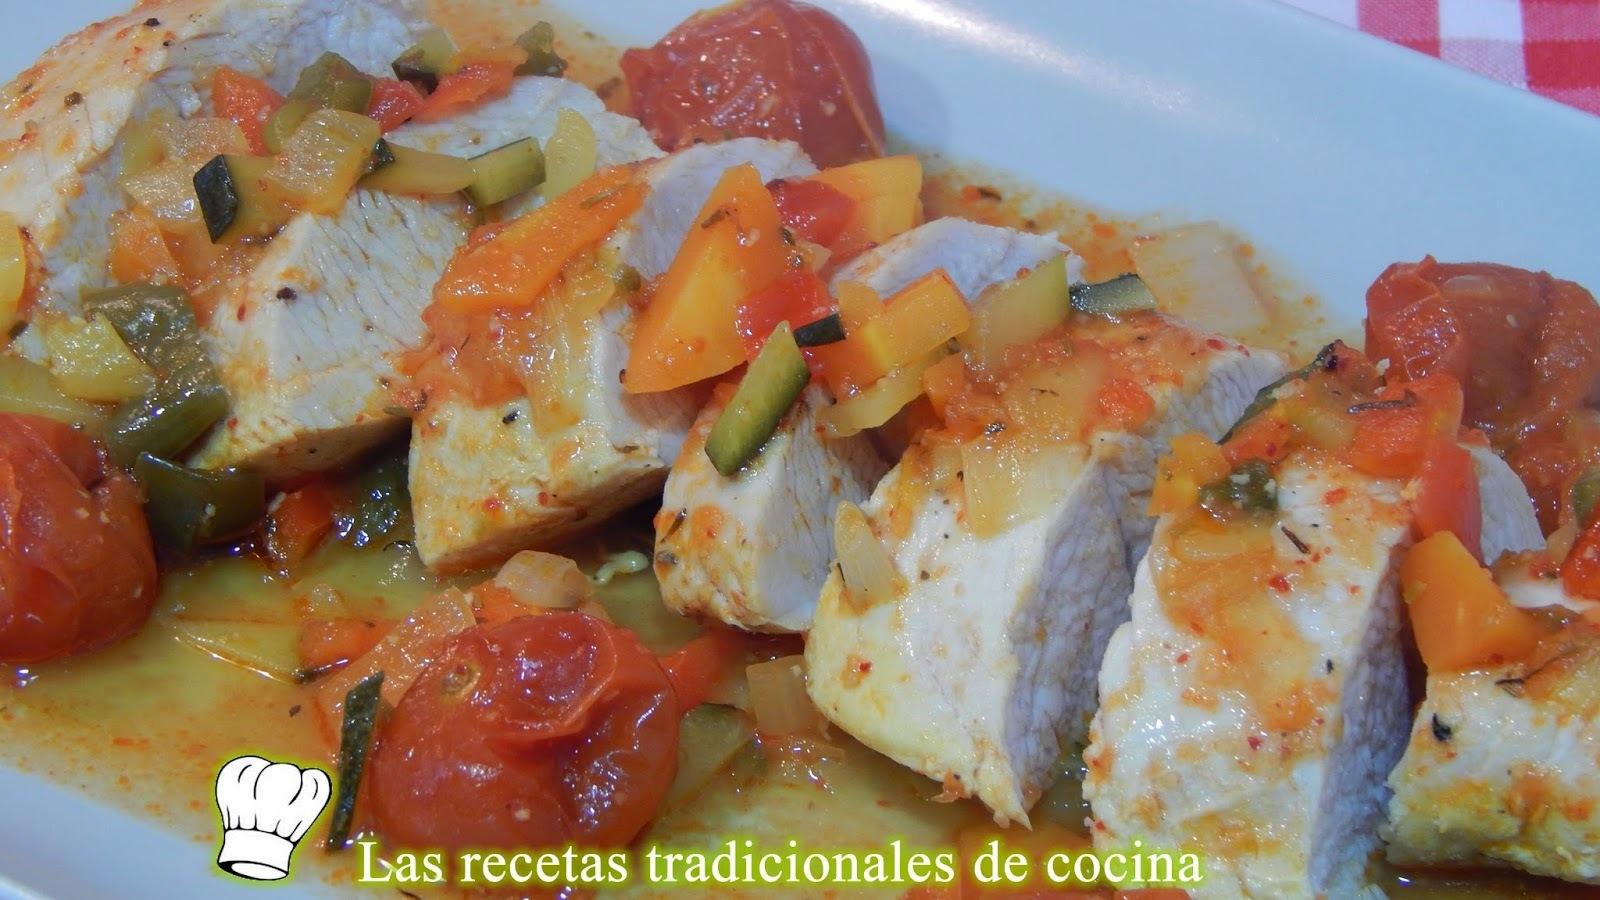 Solomillo de pavo al horno con verduras